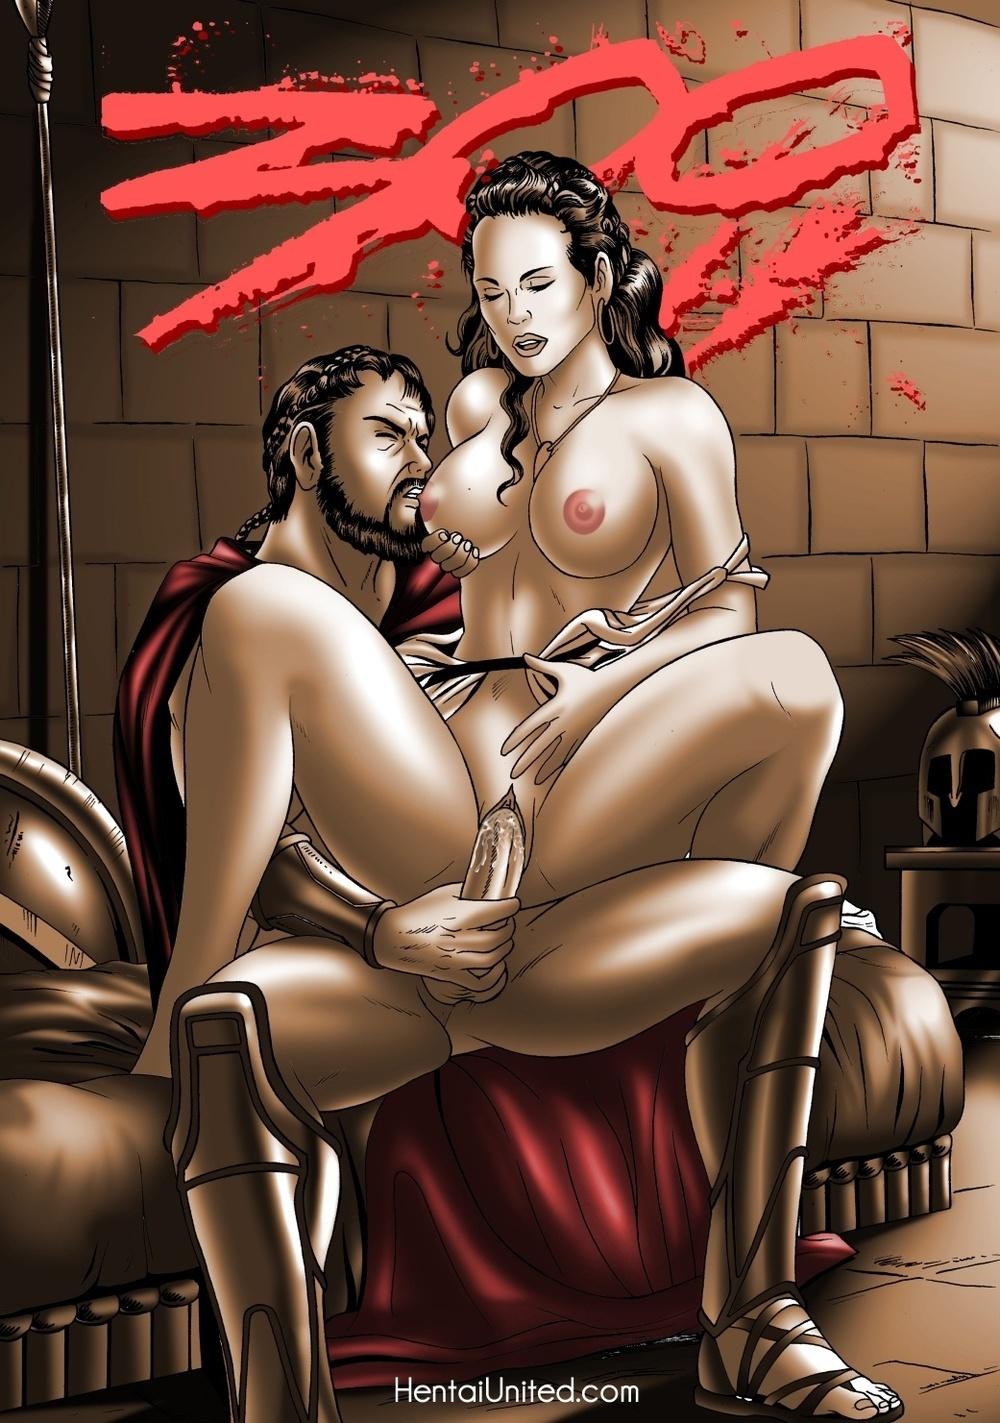 Онлайн порно пародия 300 спартанцев